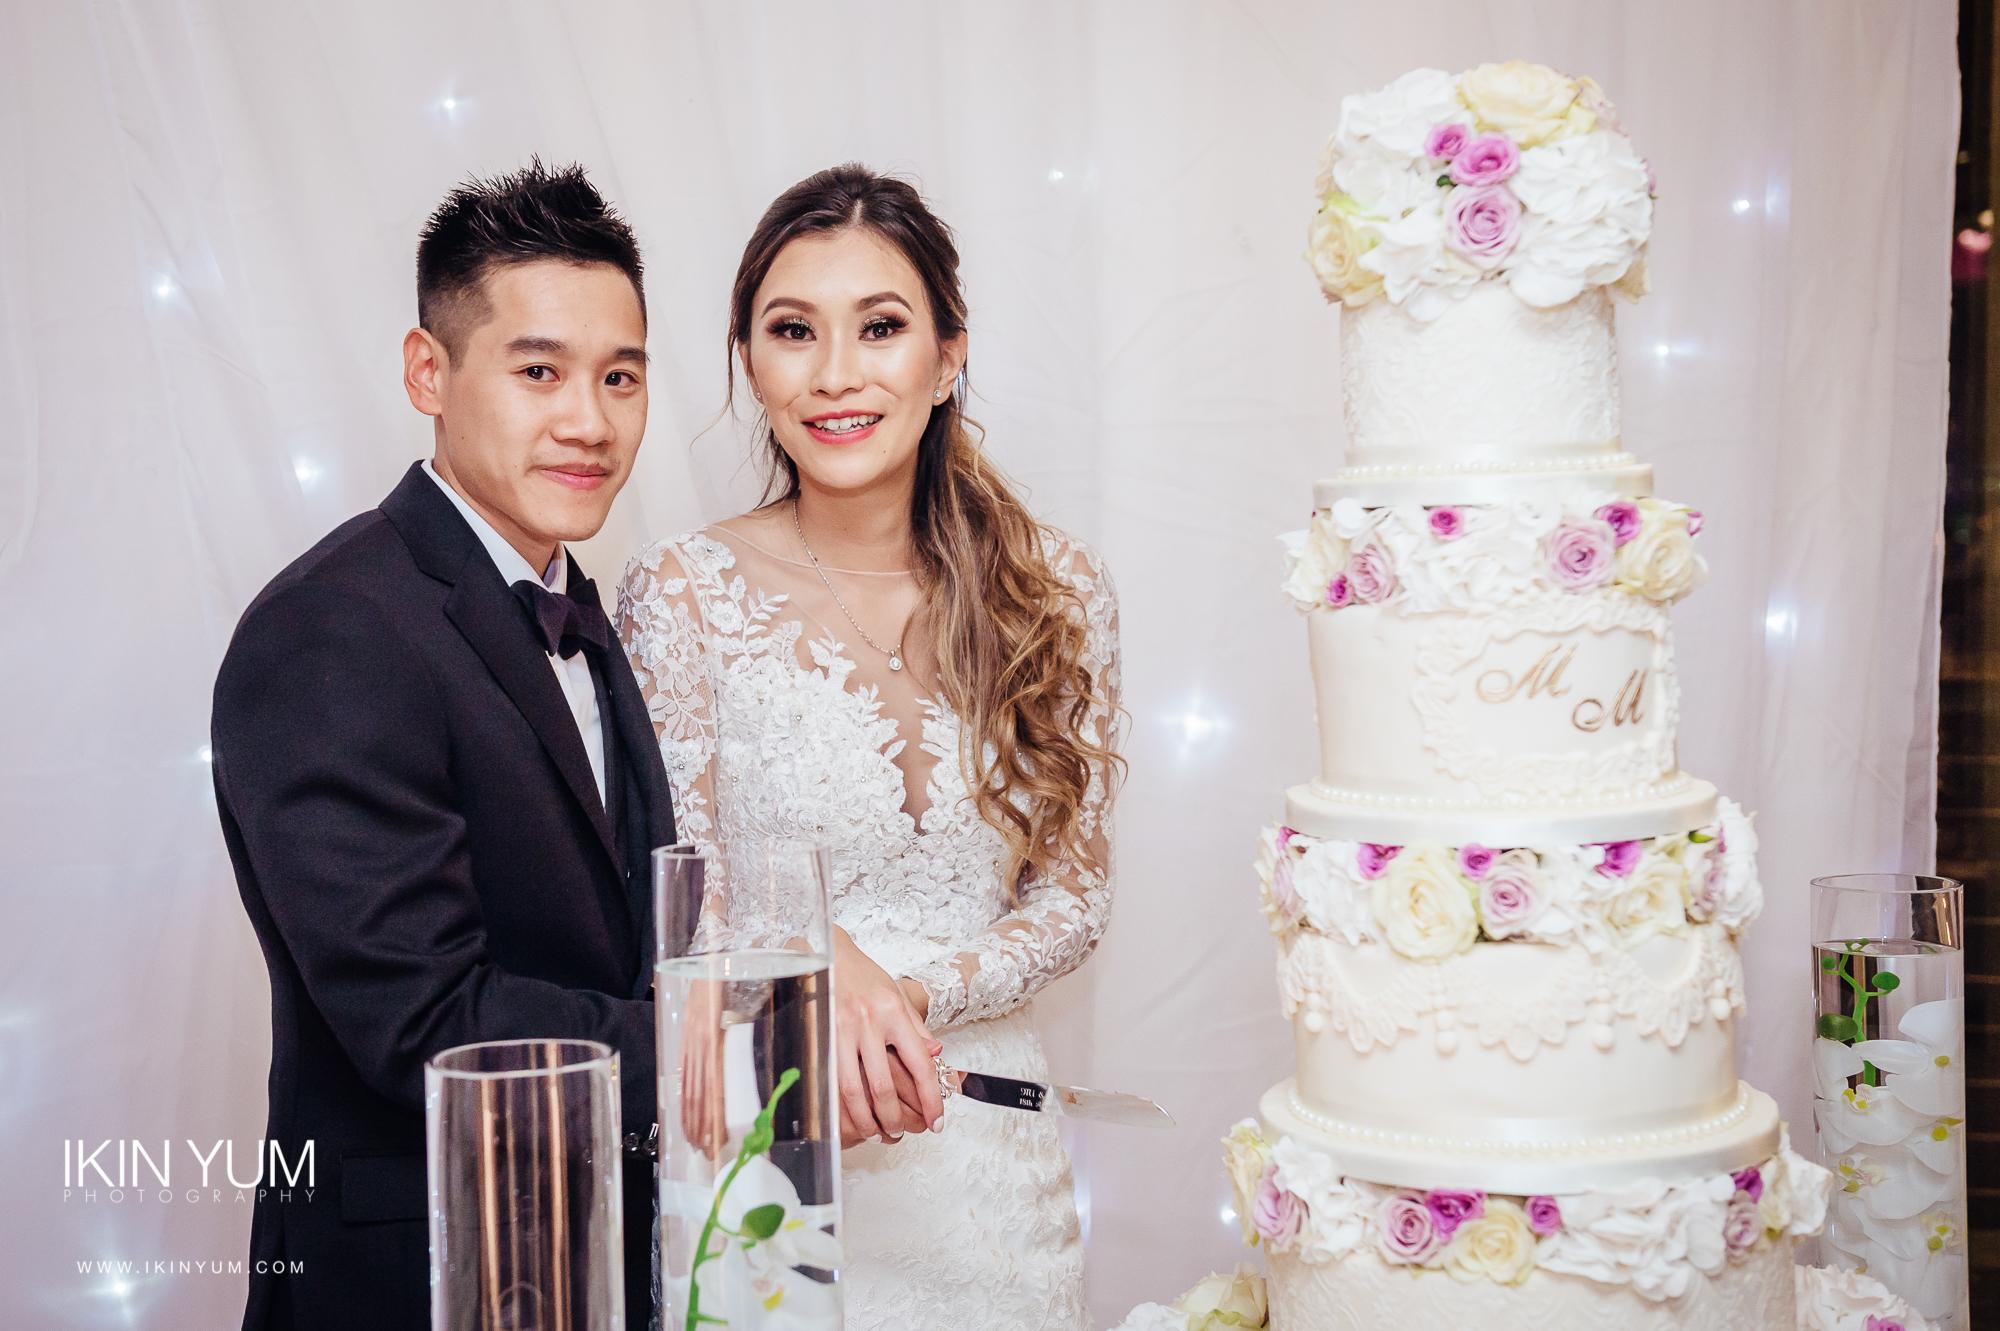 Syon Park Wedding - Ikin Yum Photography -131.jpg